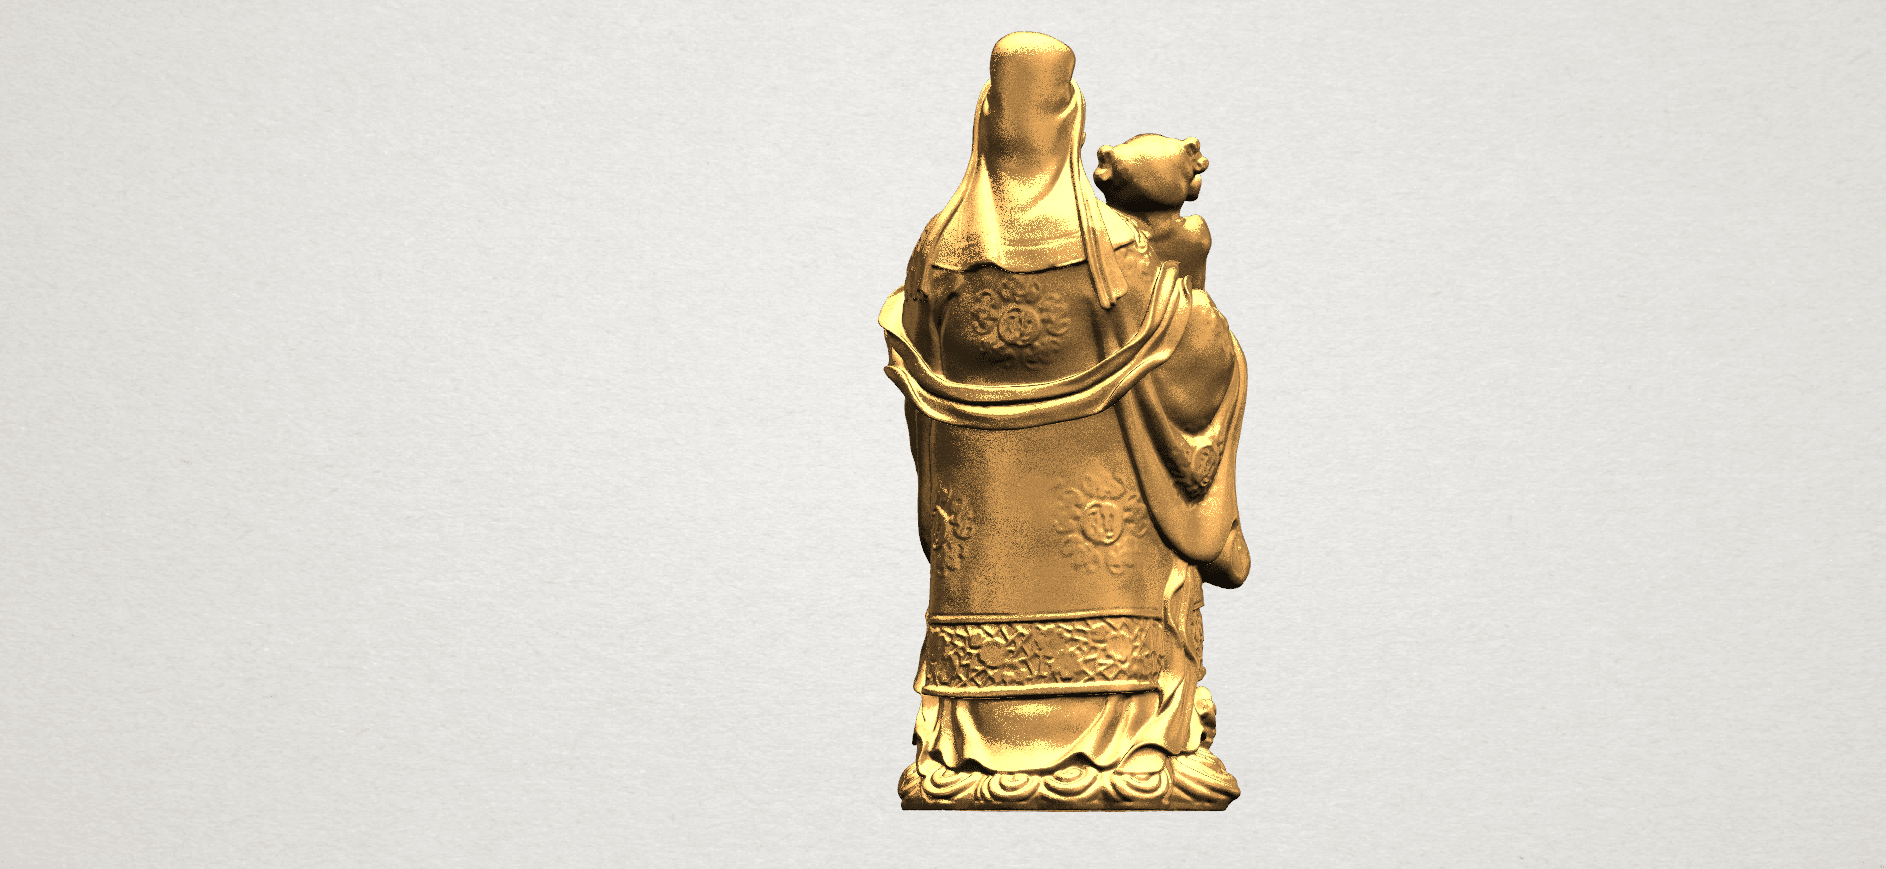 Fook (Fook Look Sao) 80mm - B04.png Download free STL file Fook (Fook Look Sao) • 3D printer template, GeorgesNikkei